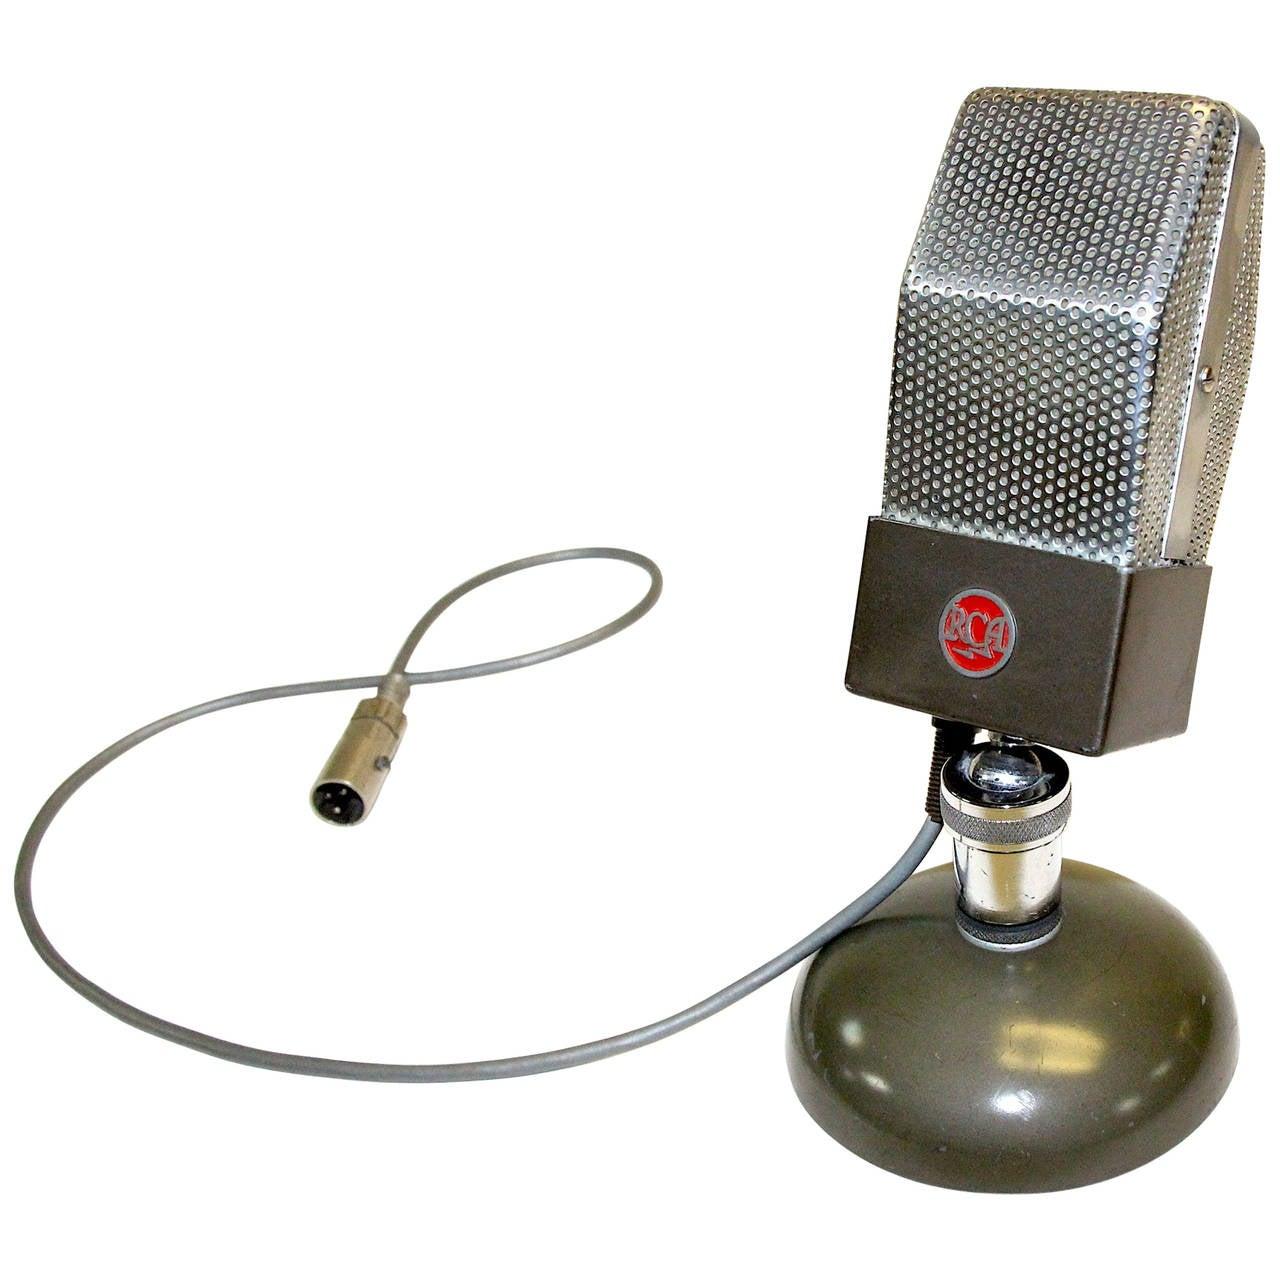 RCA Vintage Studio Microphone, Original, Iconic, circa 1930 Display as Sculpture